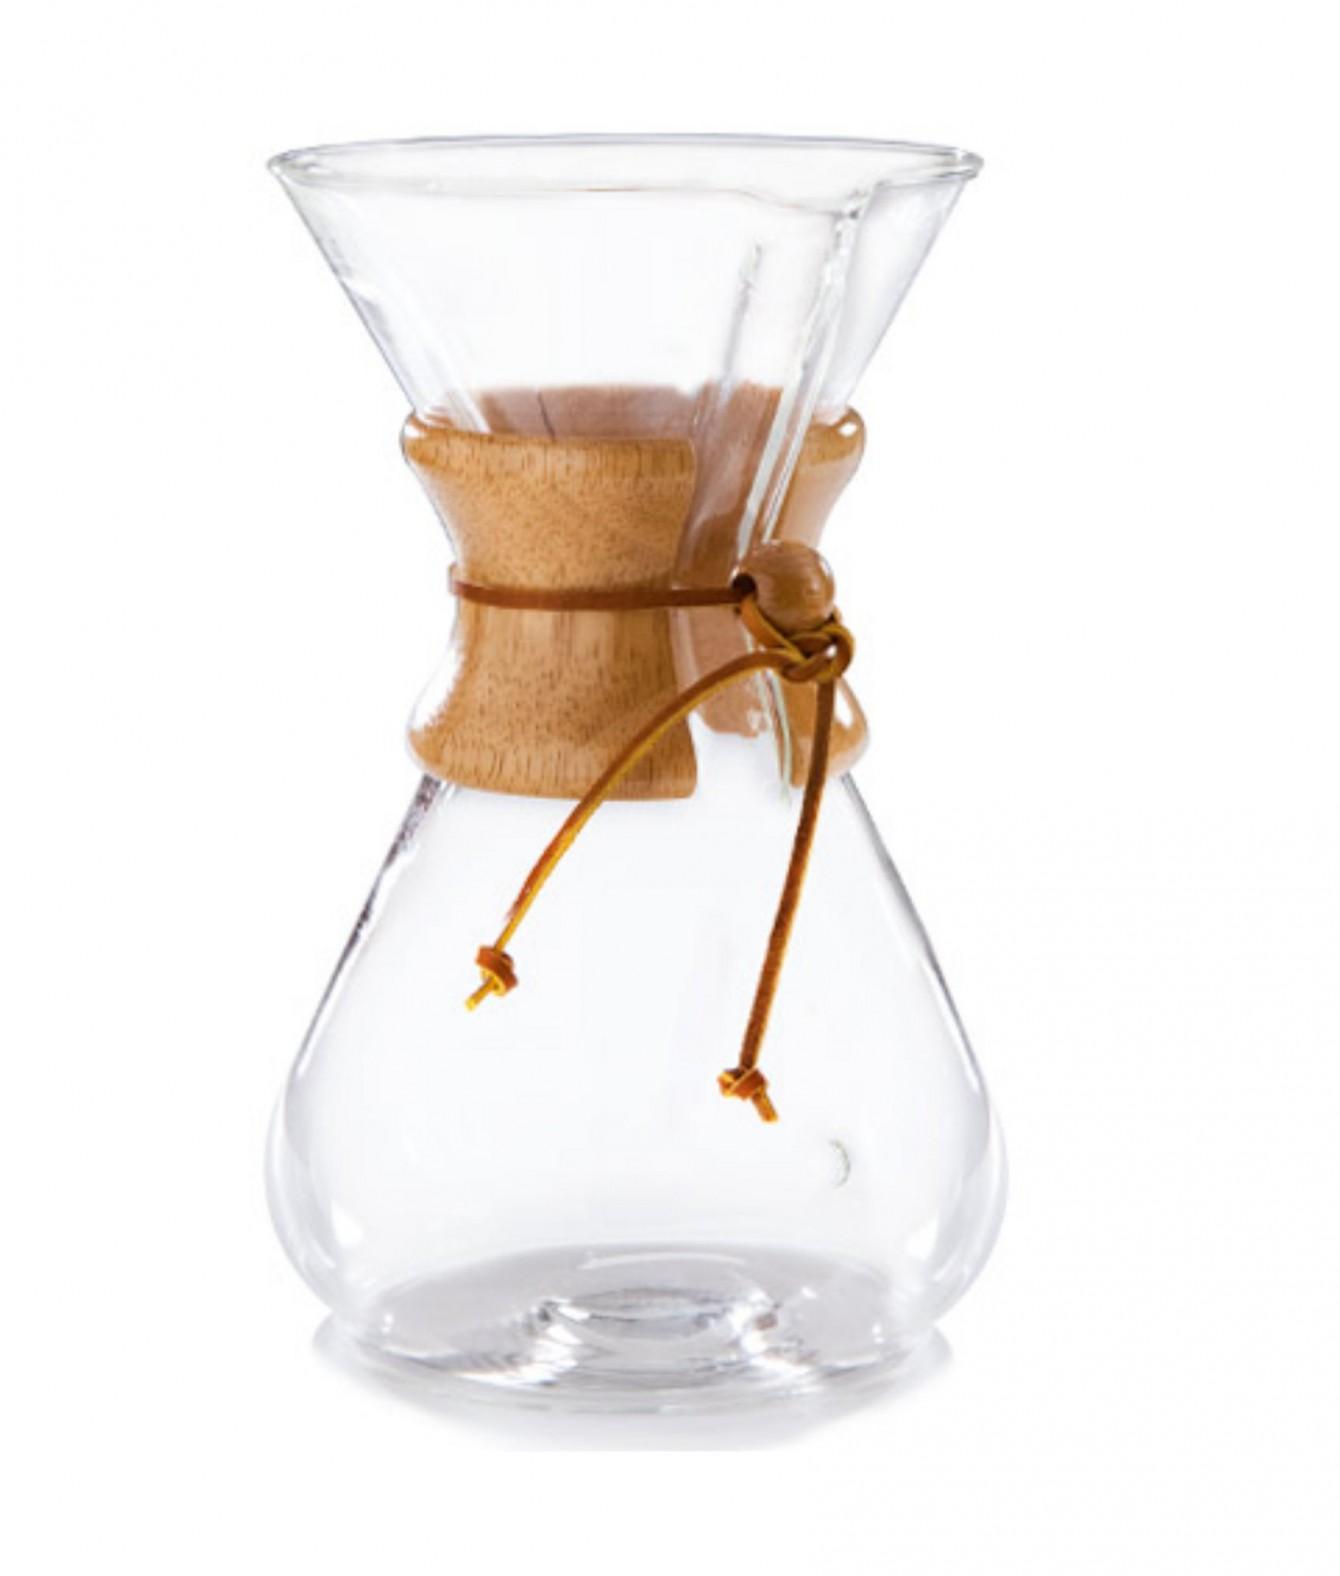 Chemex Coffee Maker 8 Cup : Chemex - Classic 8 Cup Coffee Maker - BENNETT SHOP